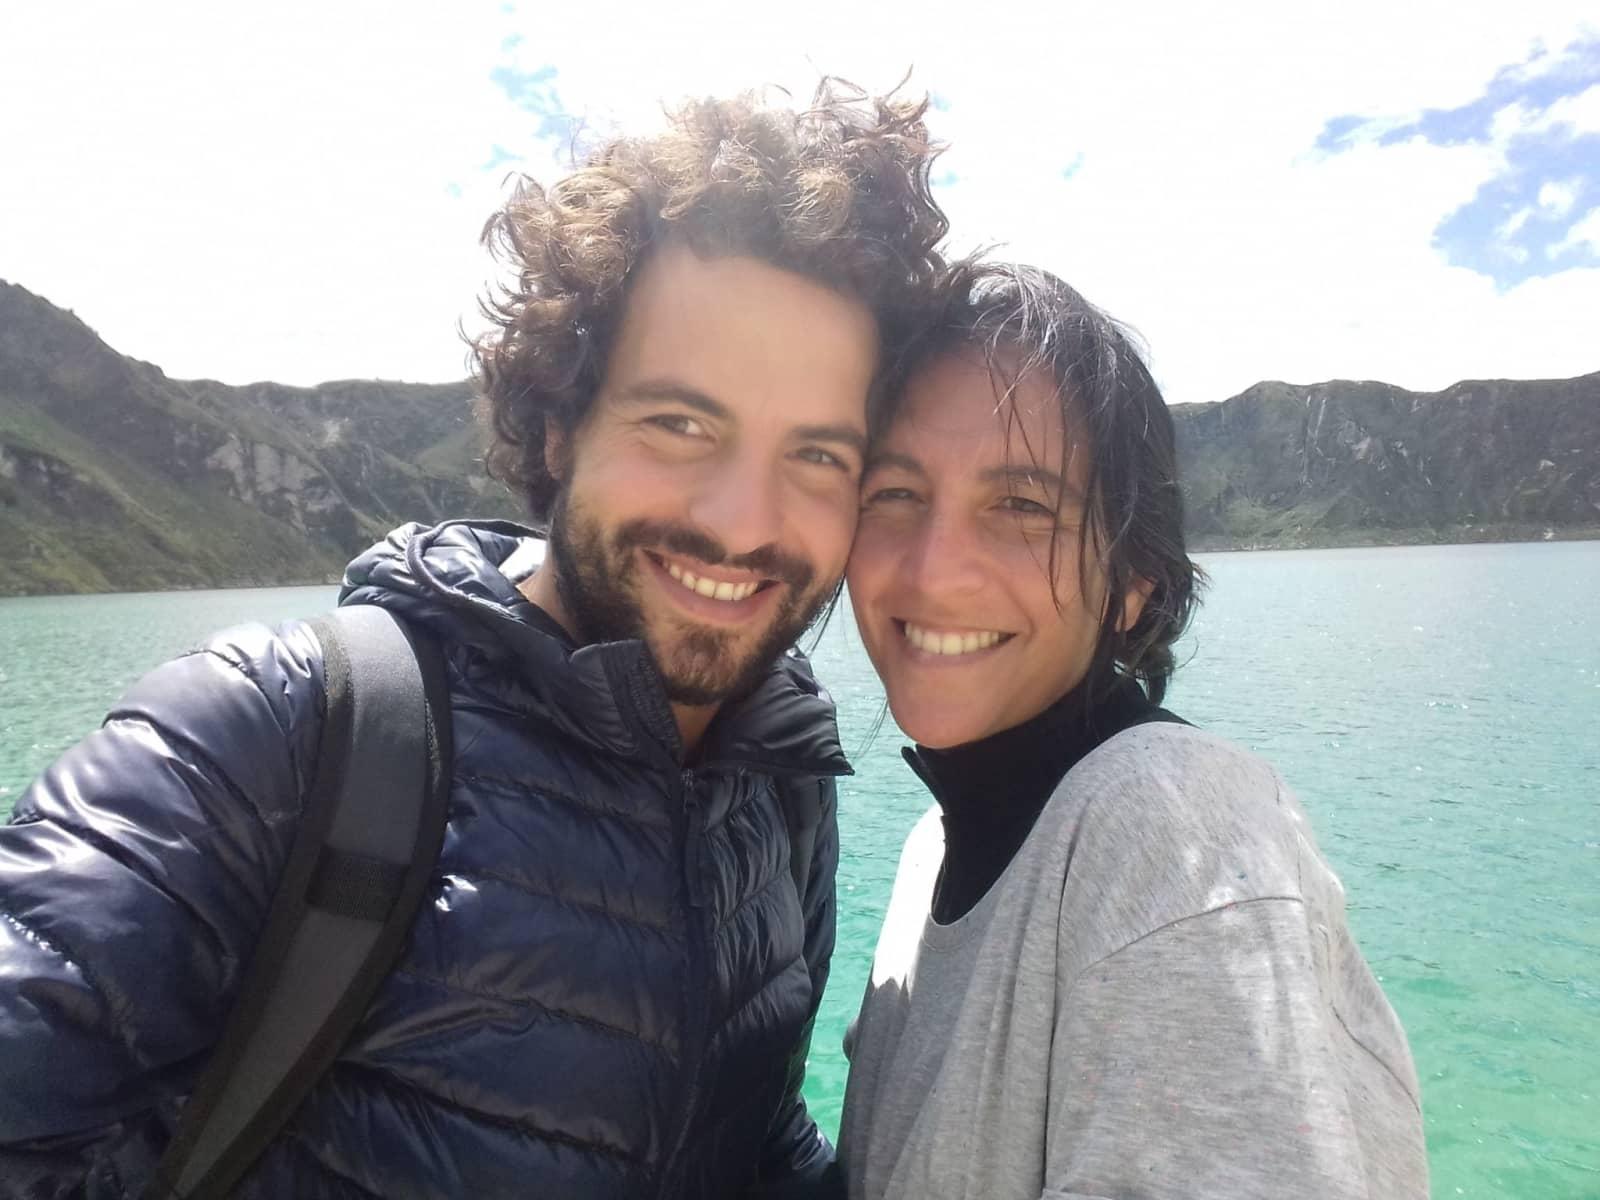 Julieta & Ciro from Buenos Aires, Argentina